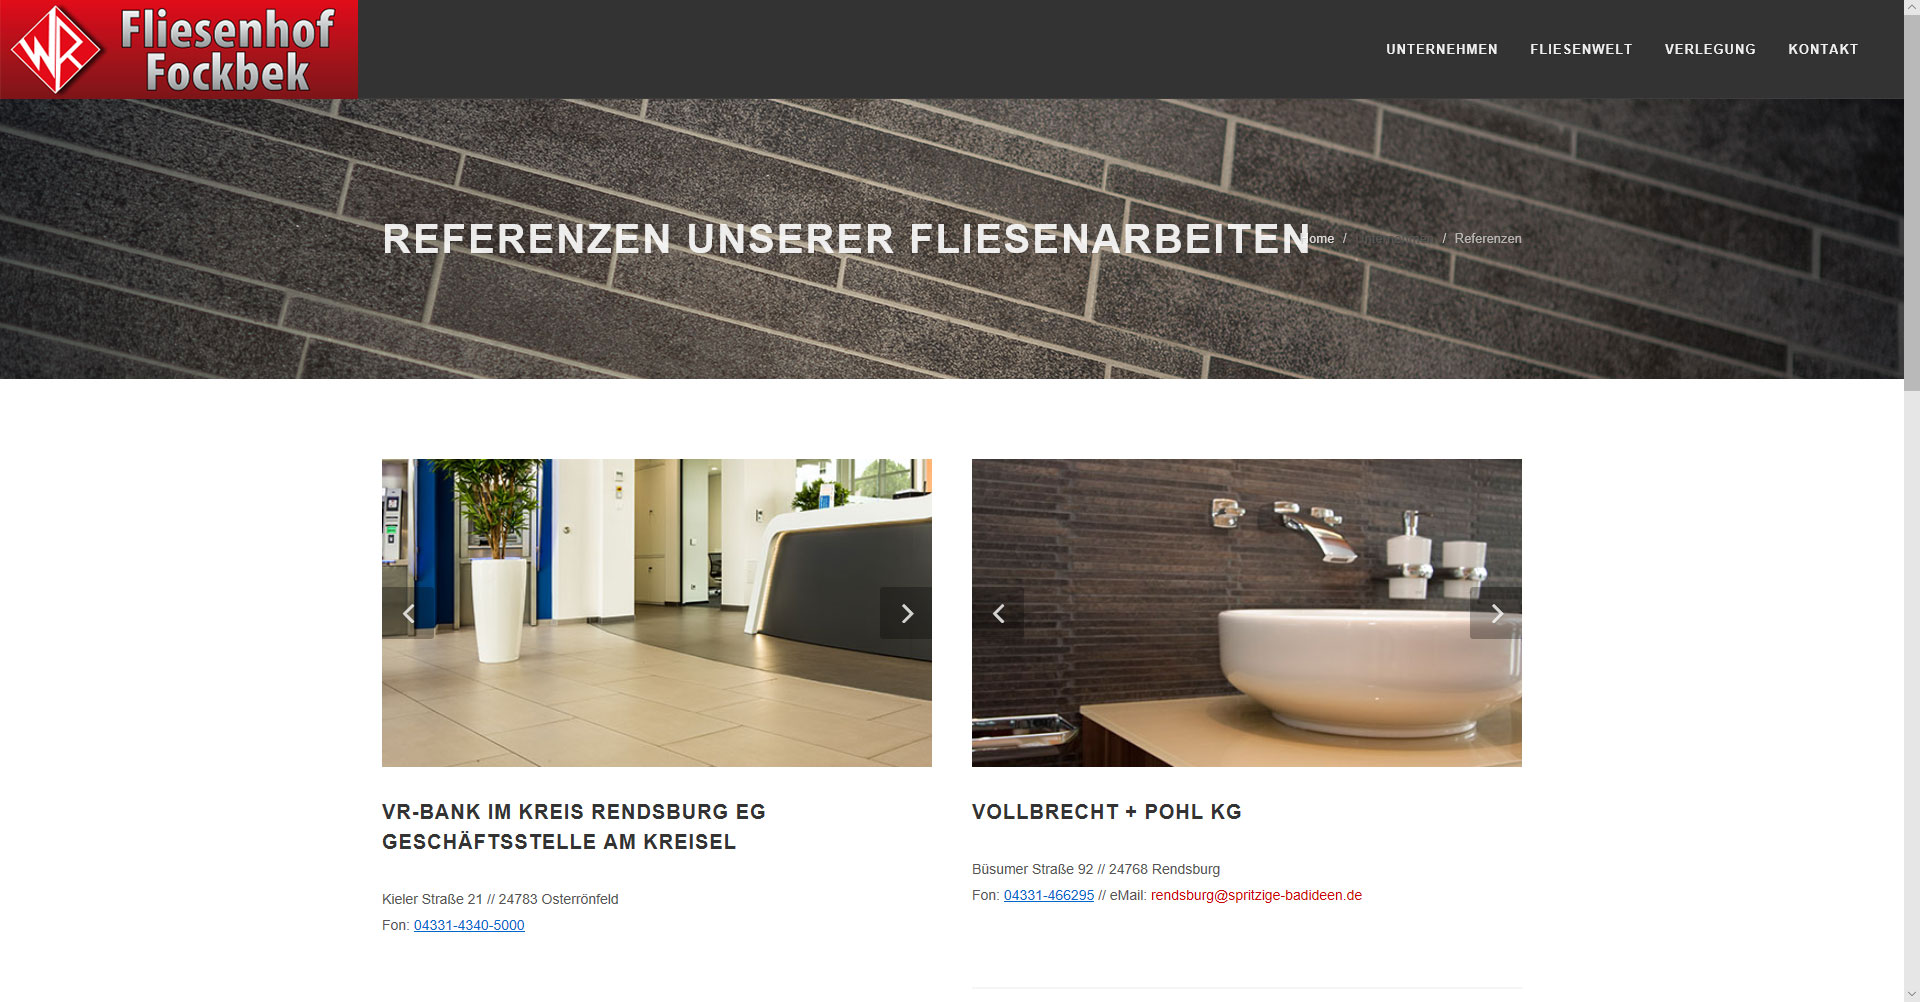 Referenzprojekte unserer Fliesenarbeiten - Fliesenhof Fockbek